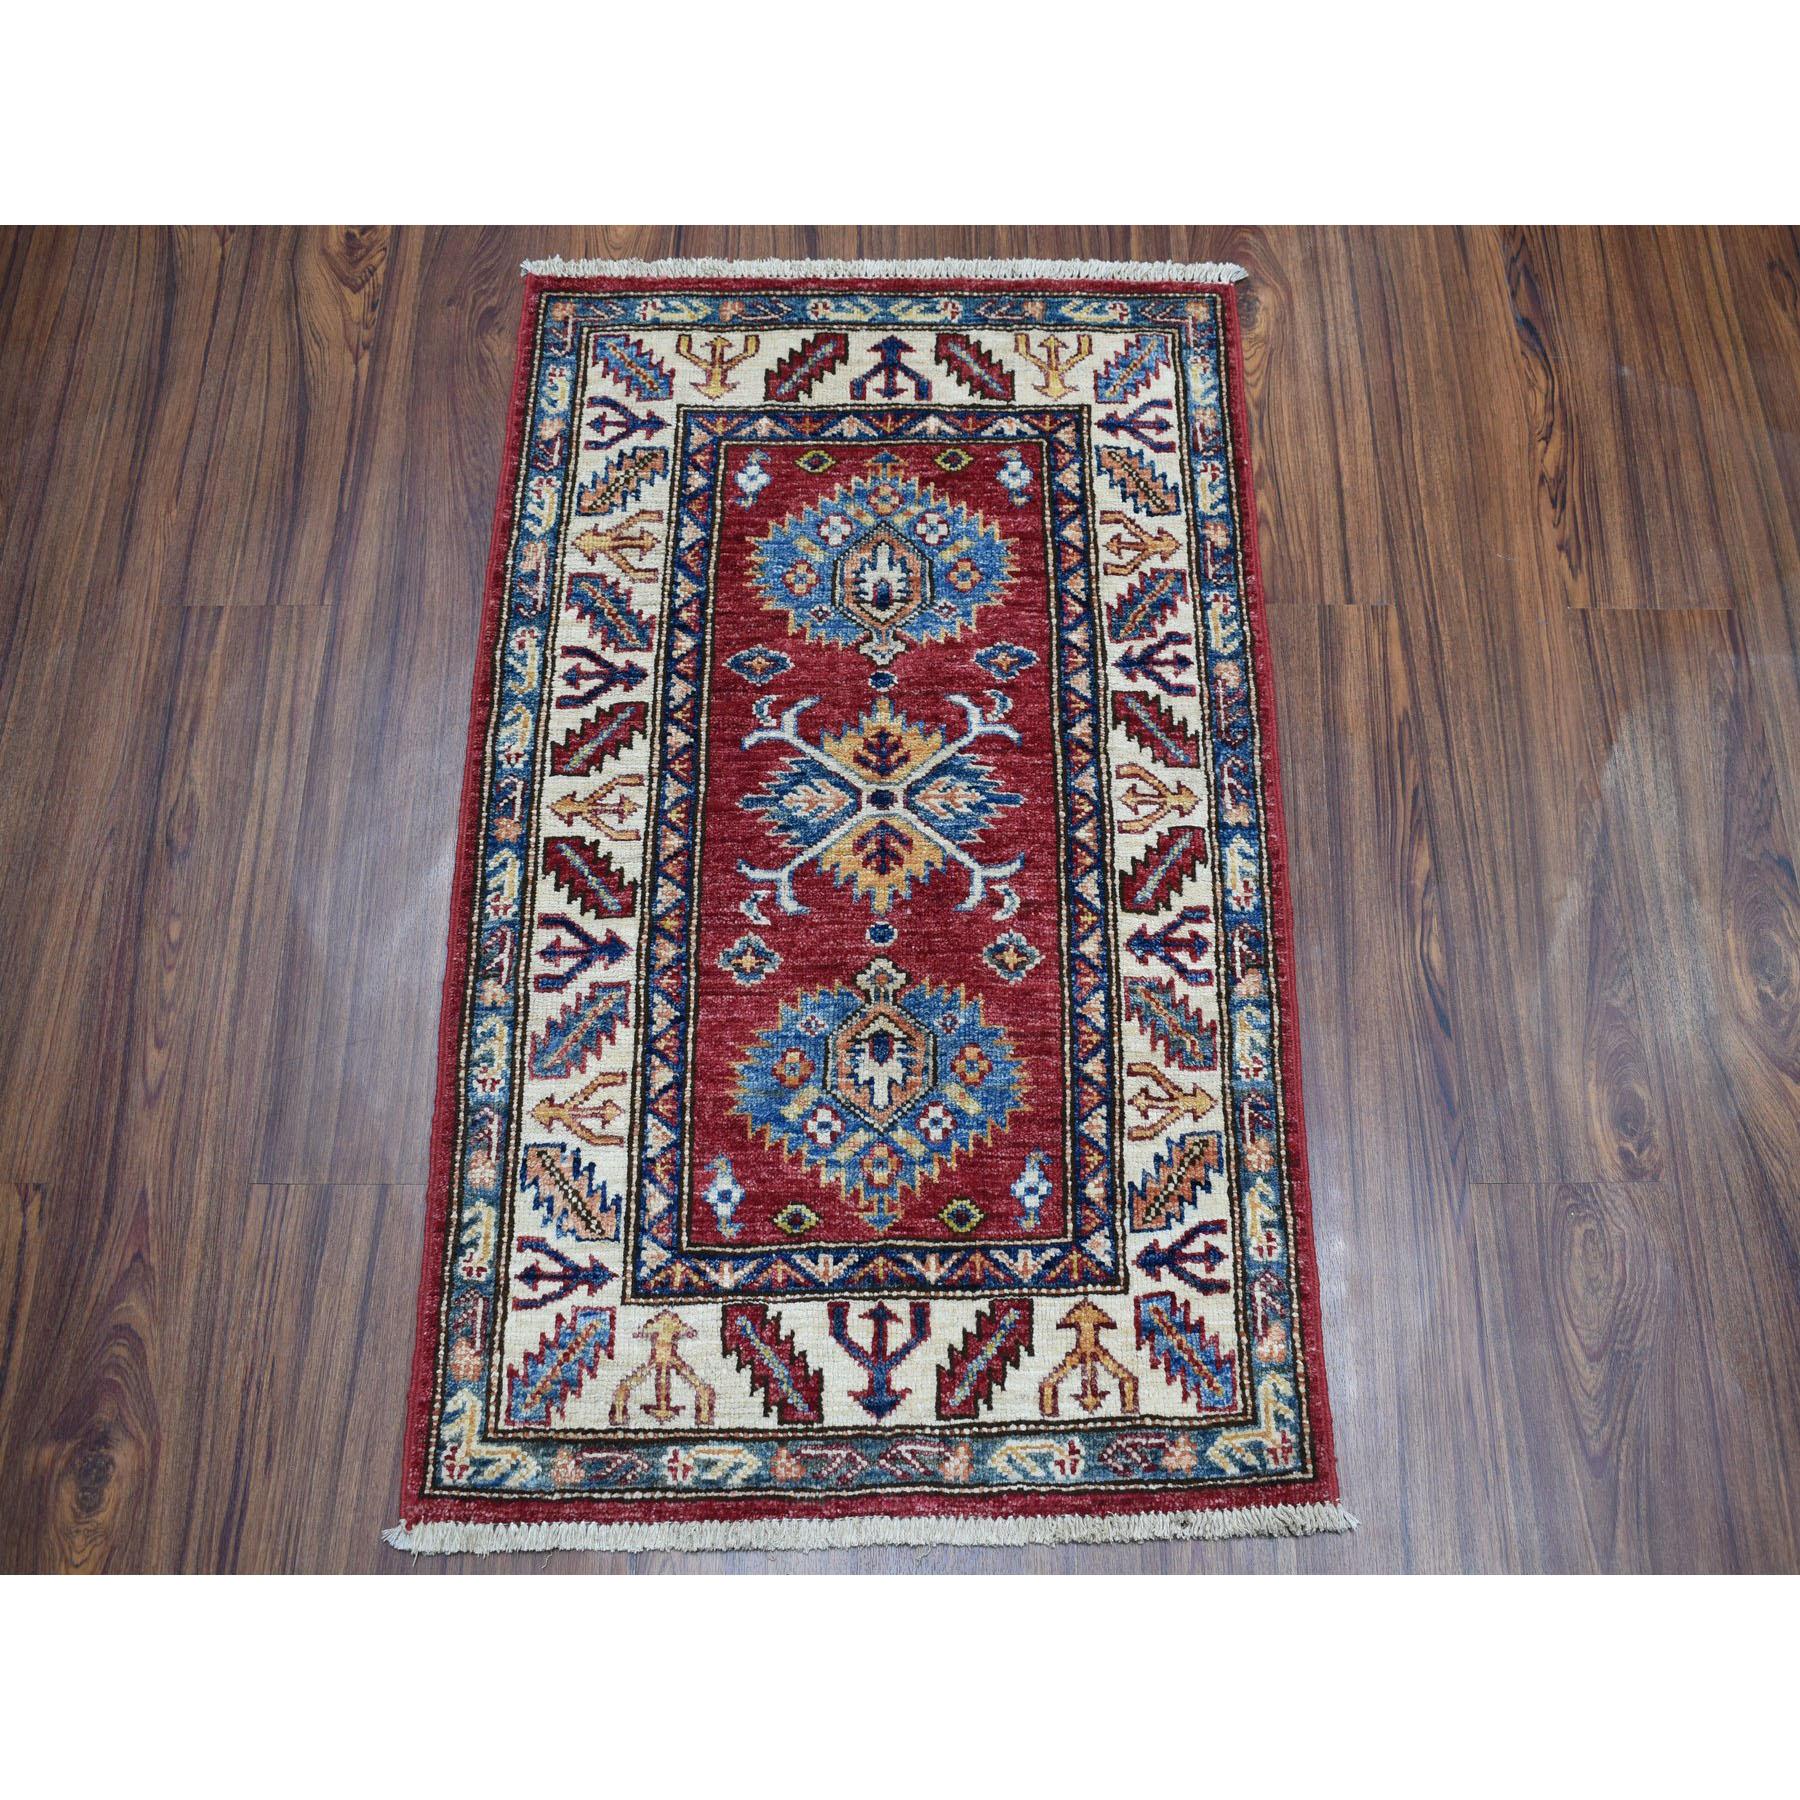 2-2 x3-2  Red Super Kazak Pure Wool Geometric Design Hand-Knotted Oriental Rug